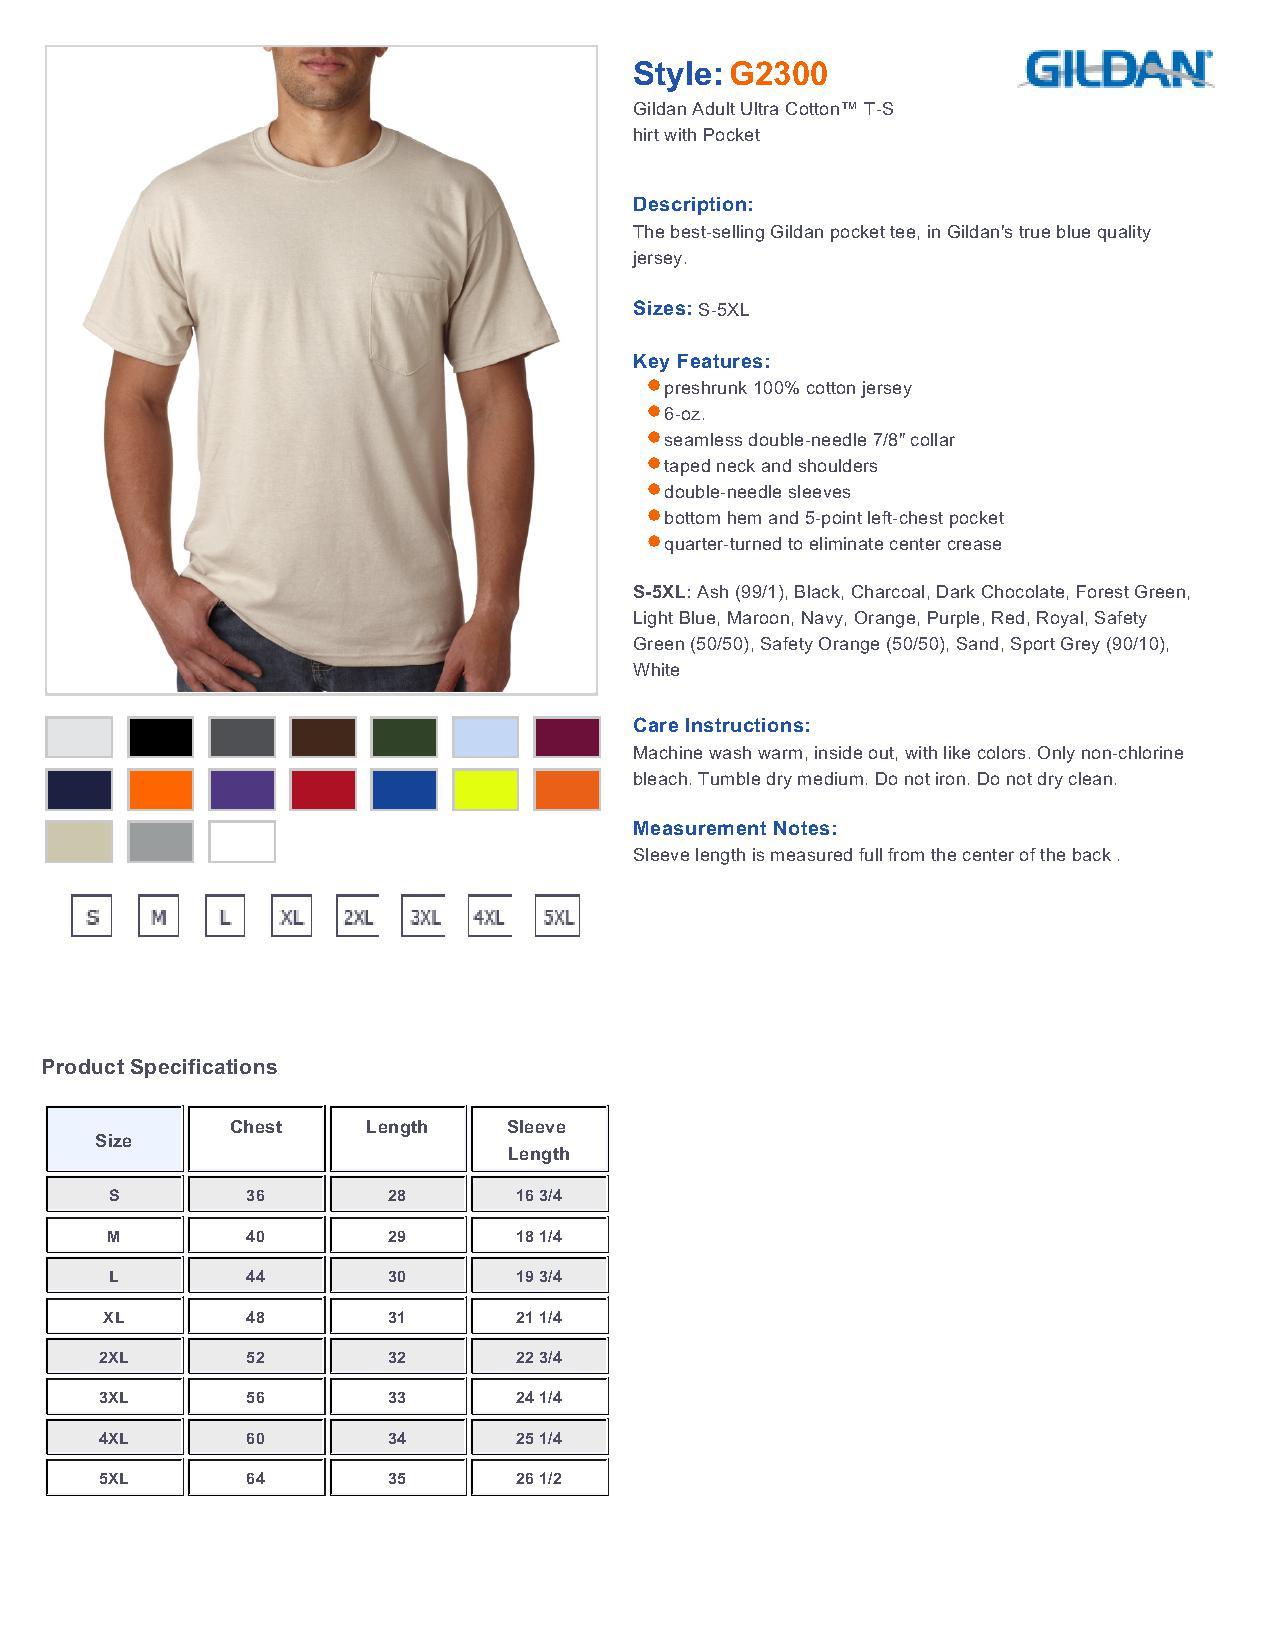 Gildan 2300 ultra cotton t shirt with a pocket 575 t shirts specs sizing specs nvjuhfo Images